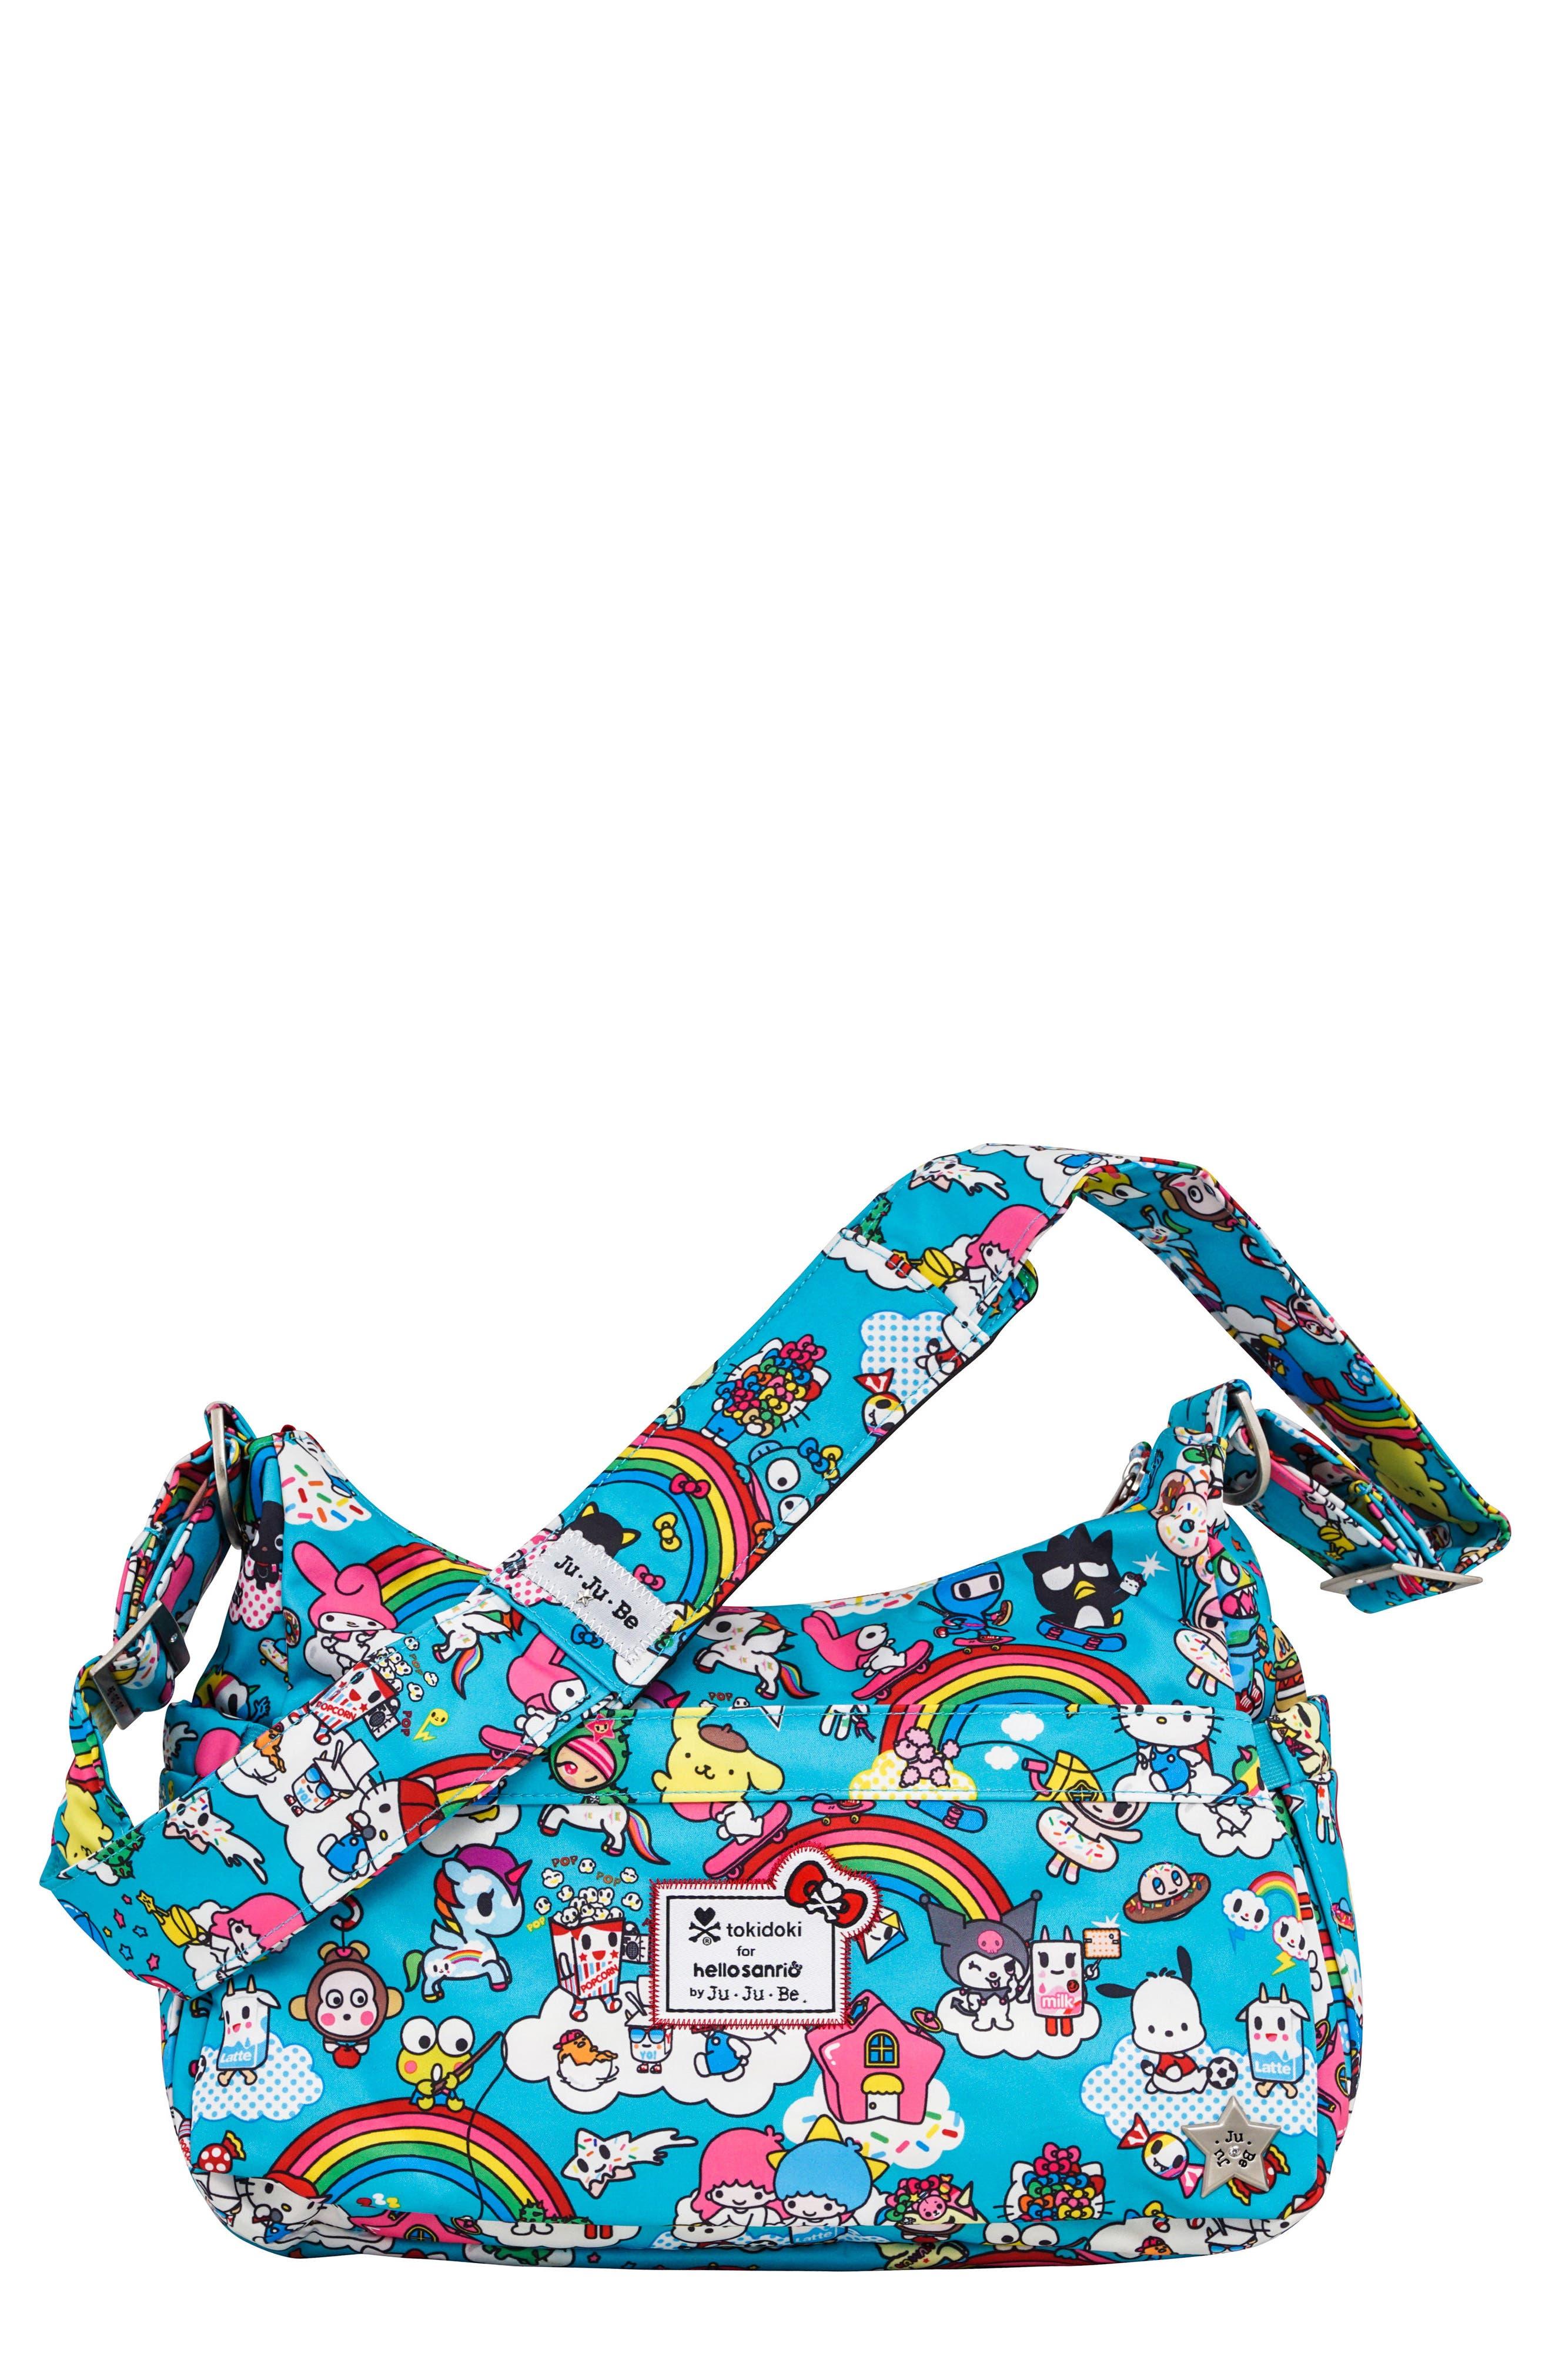 x tokidoki for Hello Sanrio Rainbow Dreams Be Hobo Diaper Bag,                             Main thumbnail 1, color,                             Rainbow Dreams